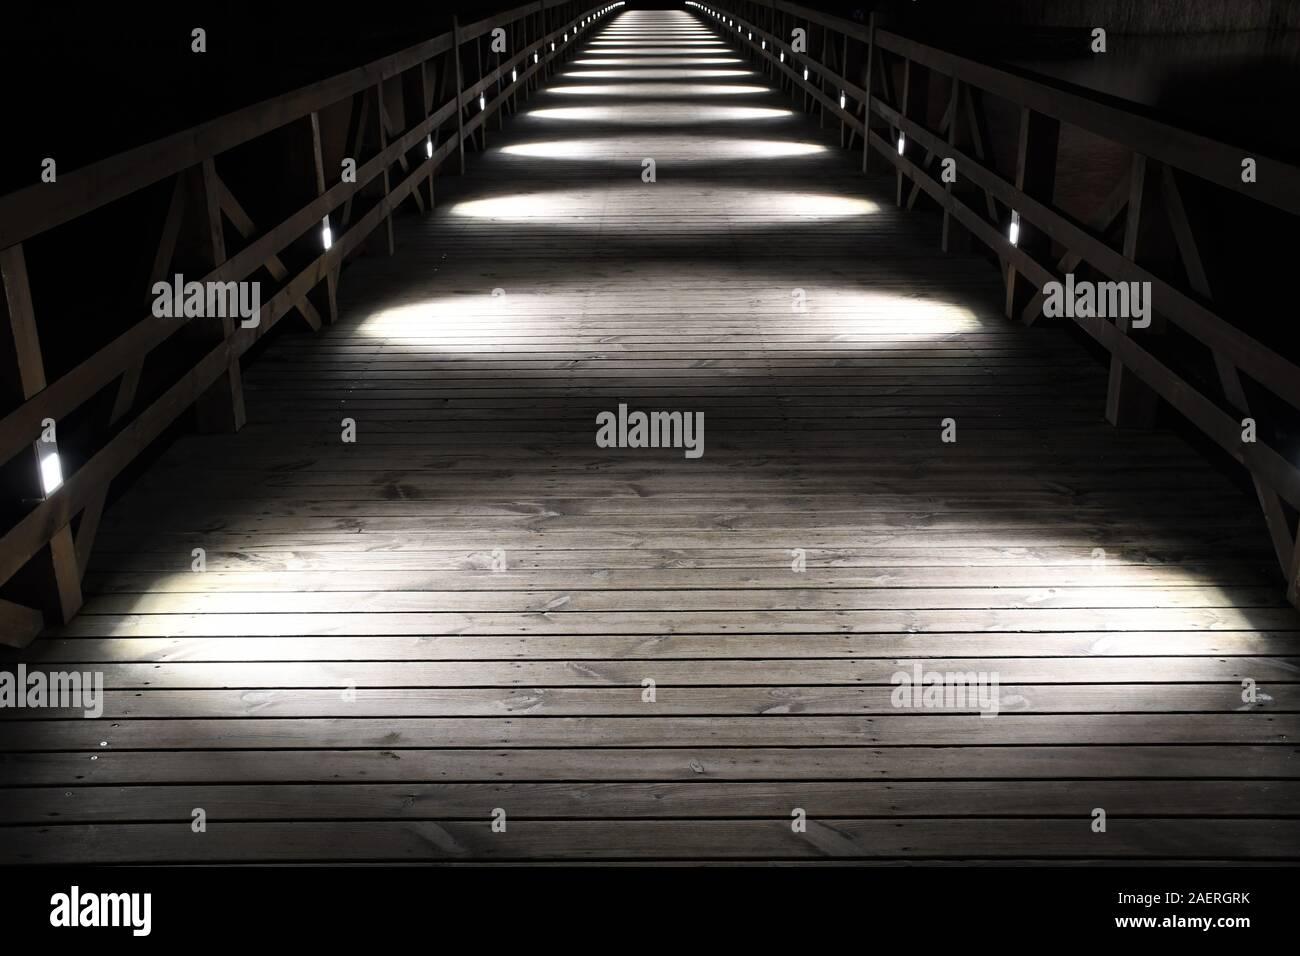 Wooden bridge illuminated by white circular lights at night, perspective Stock Photo